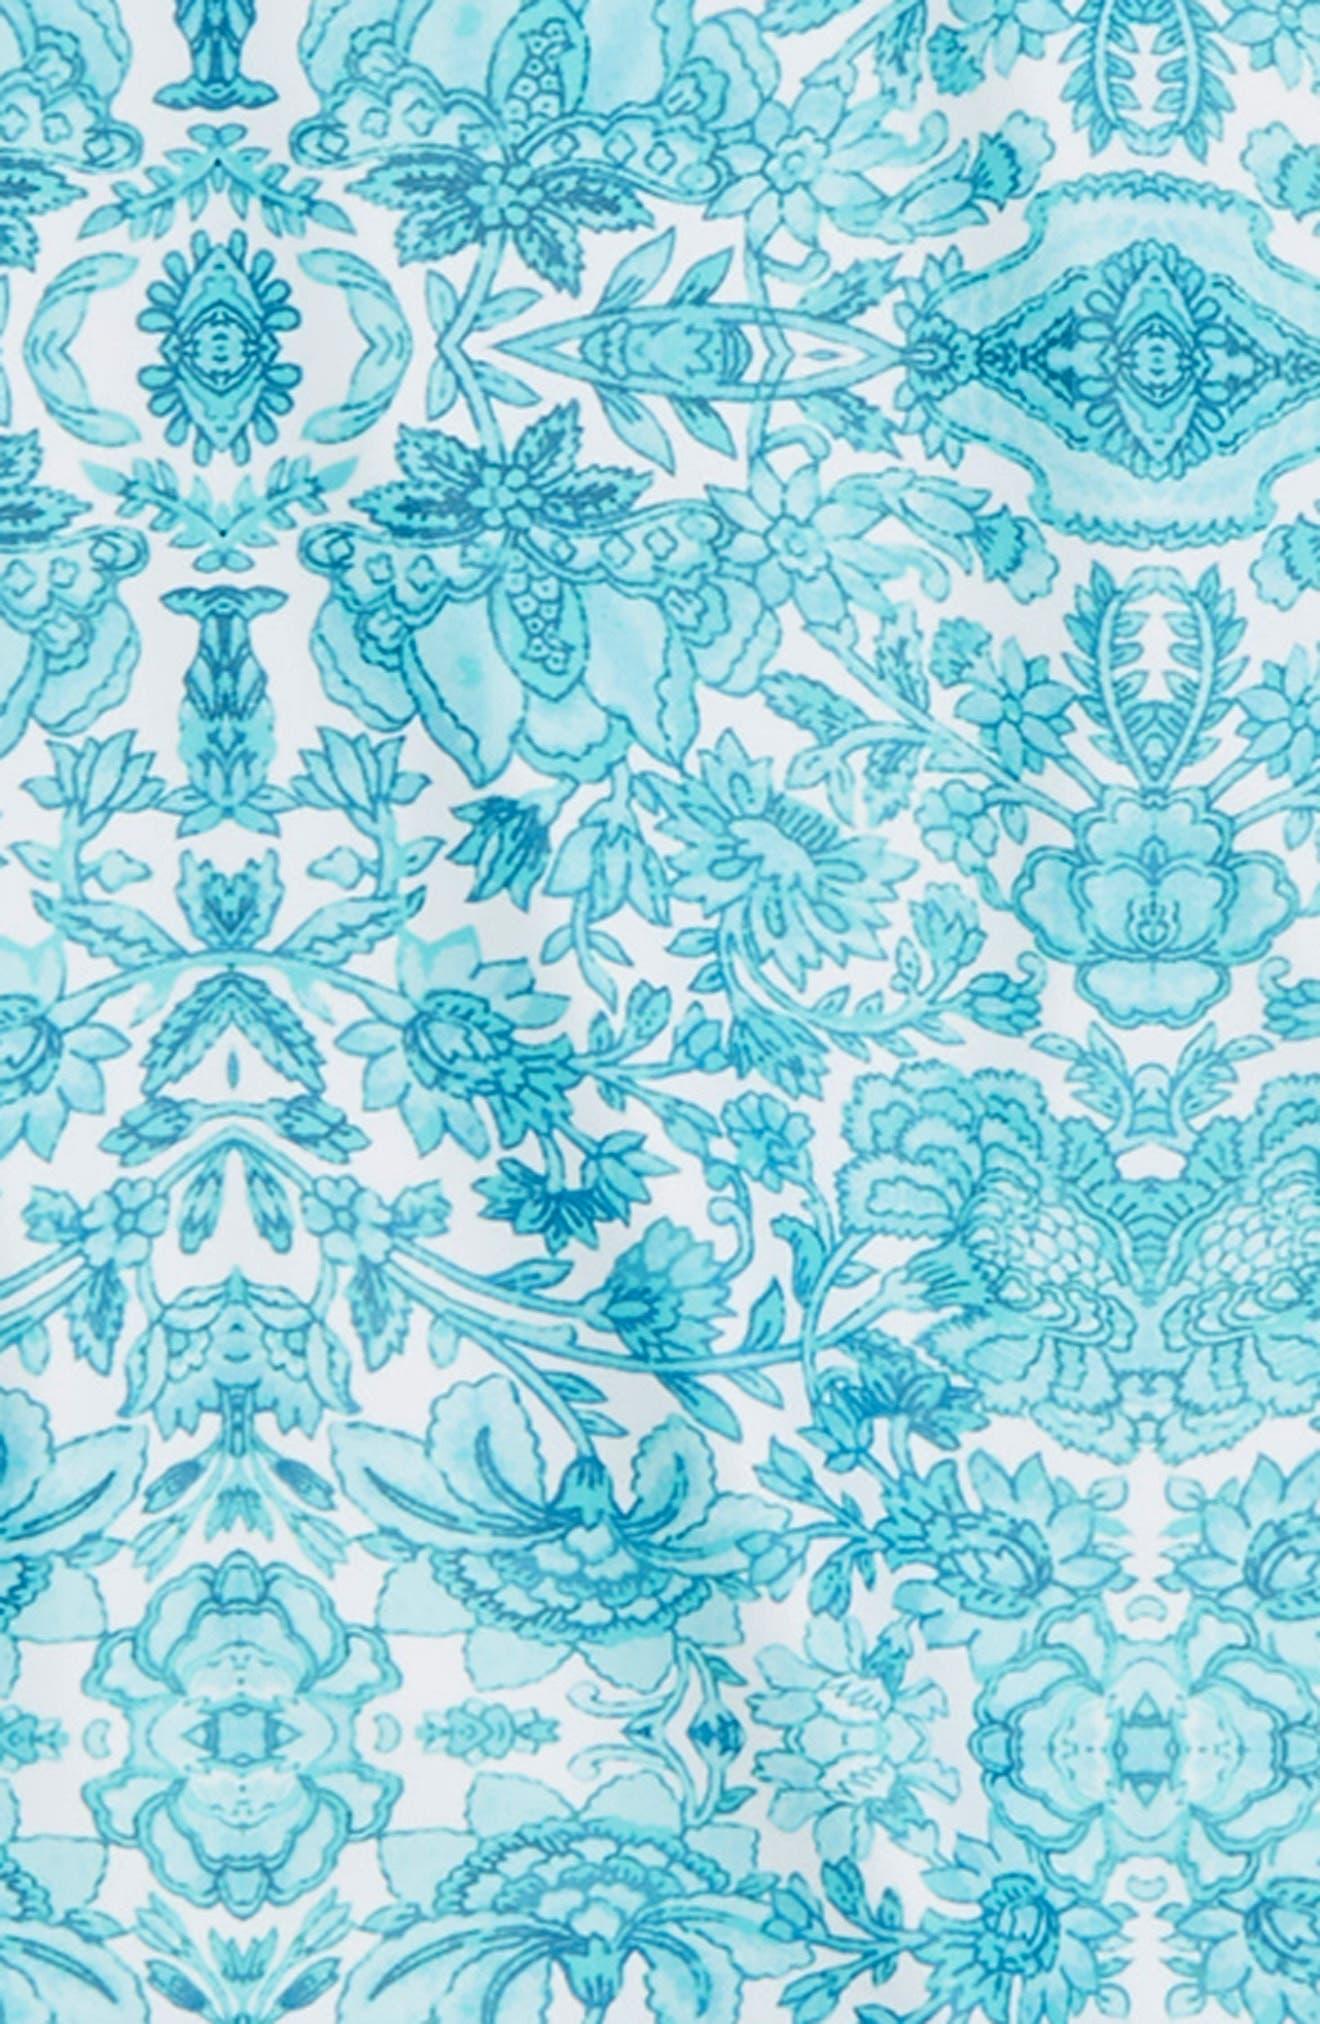 Ocean Tapestry Two-Piece Rashguard Swimsuit,                             Alternate thumbnail 2, color,                             400